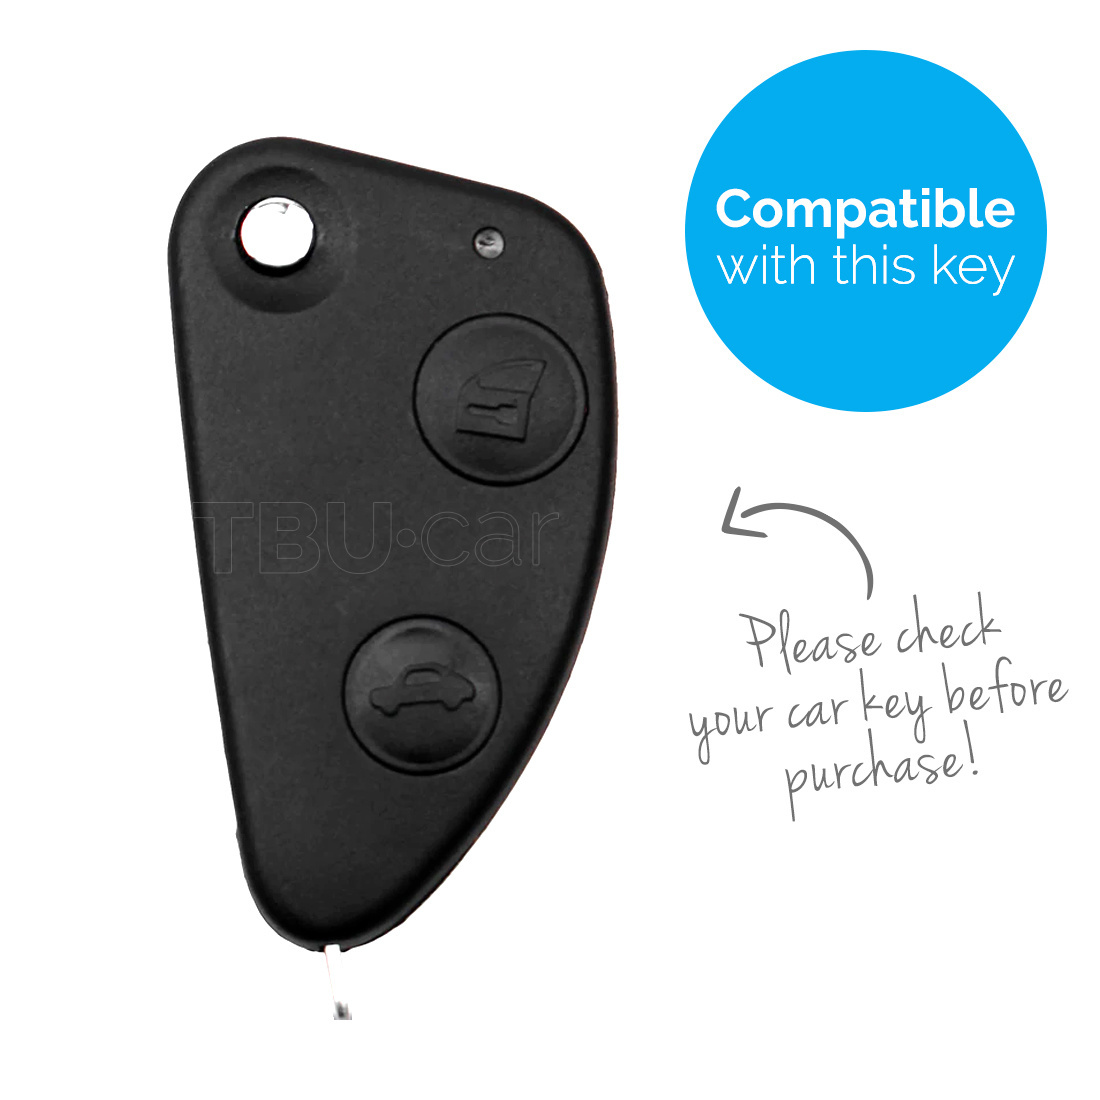 TBU car TBU car Car key cover compatible with Alfa Romeo - Silicone Protective Remote Key Shell - FOB Case Cover - Black